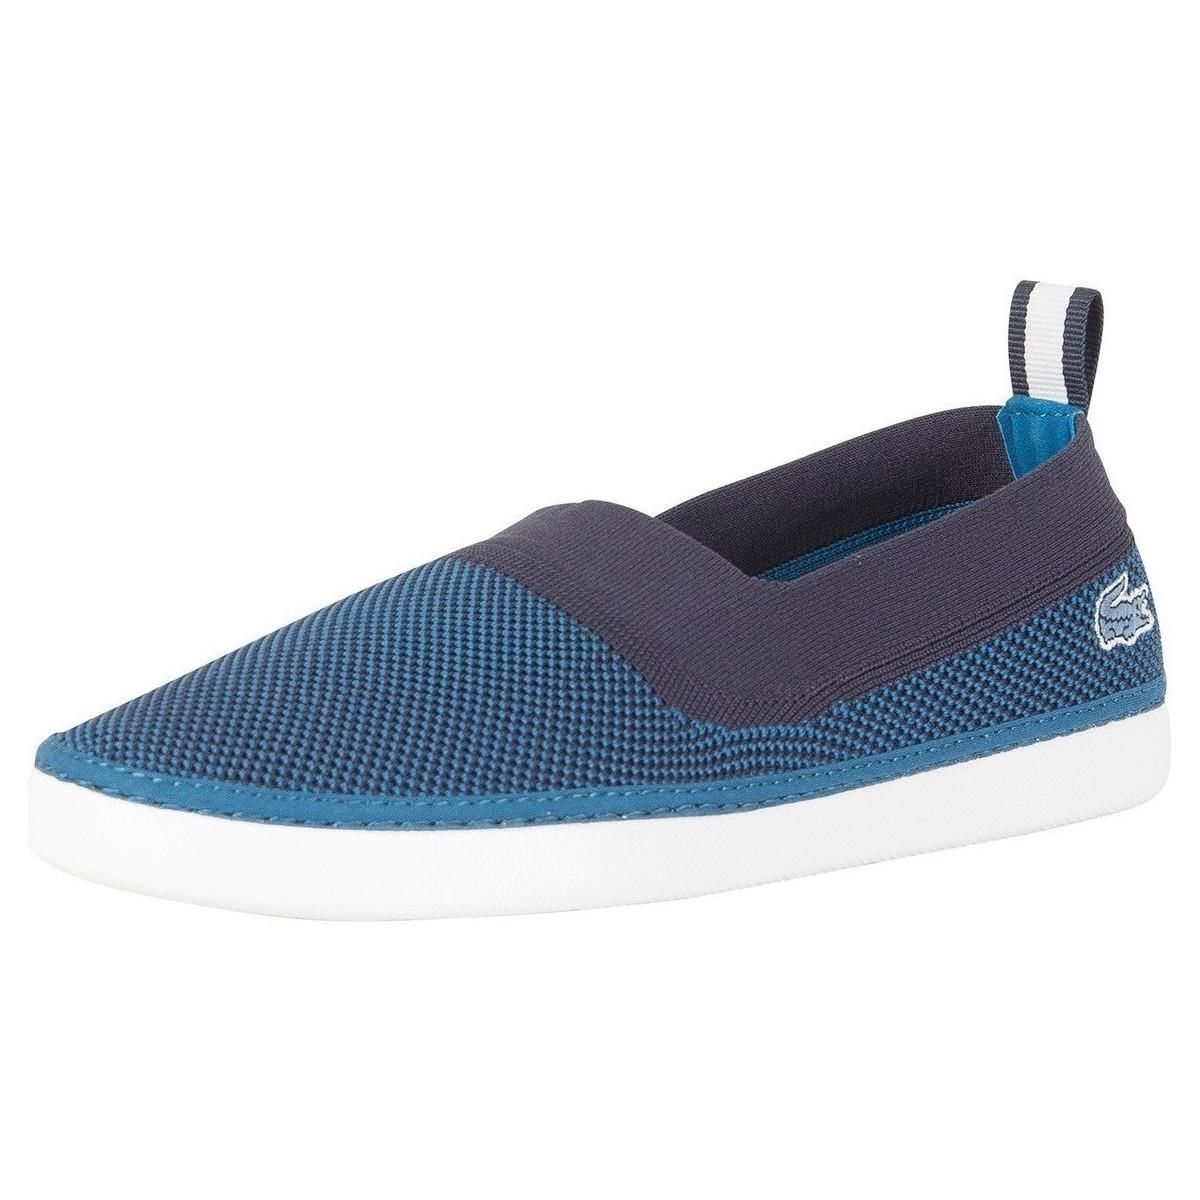 Lacoste Lydro Formateurs En Bleu - Bleu FYgPu